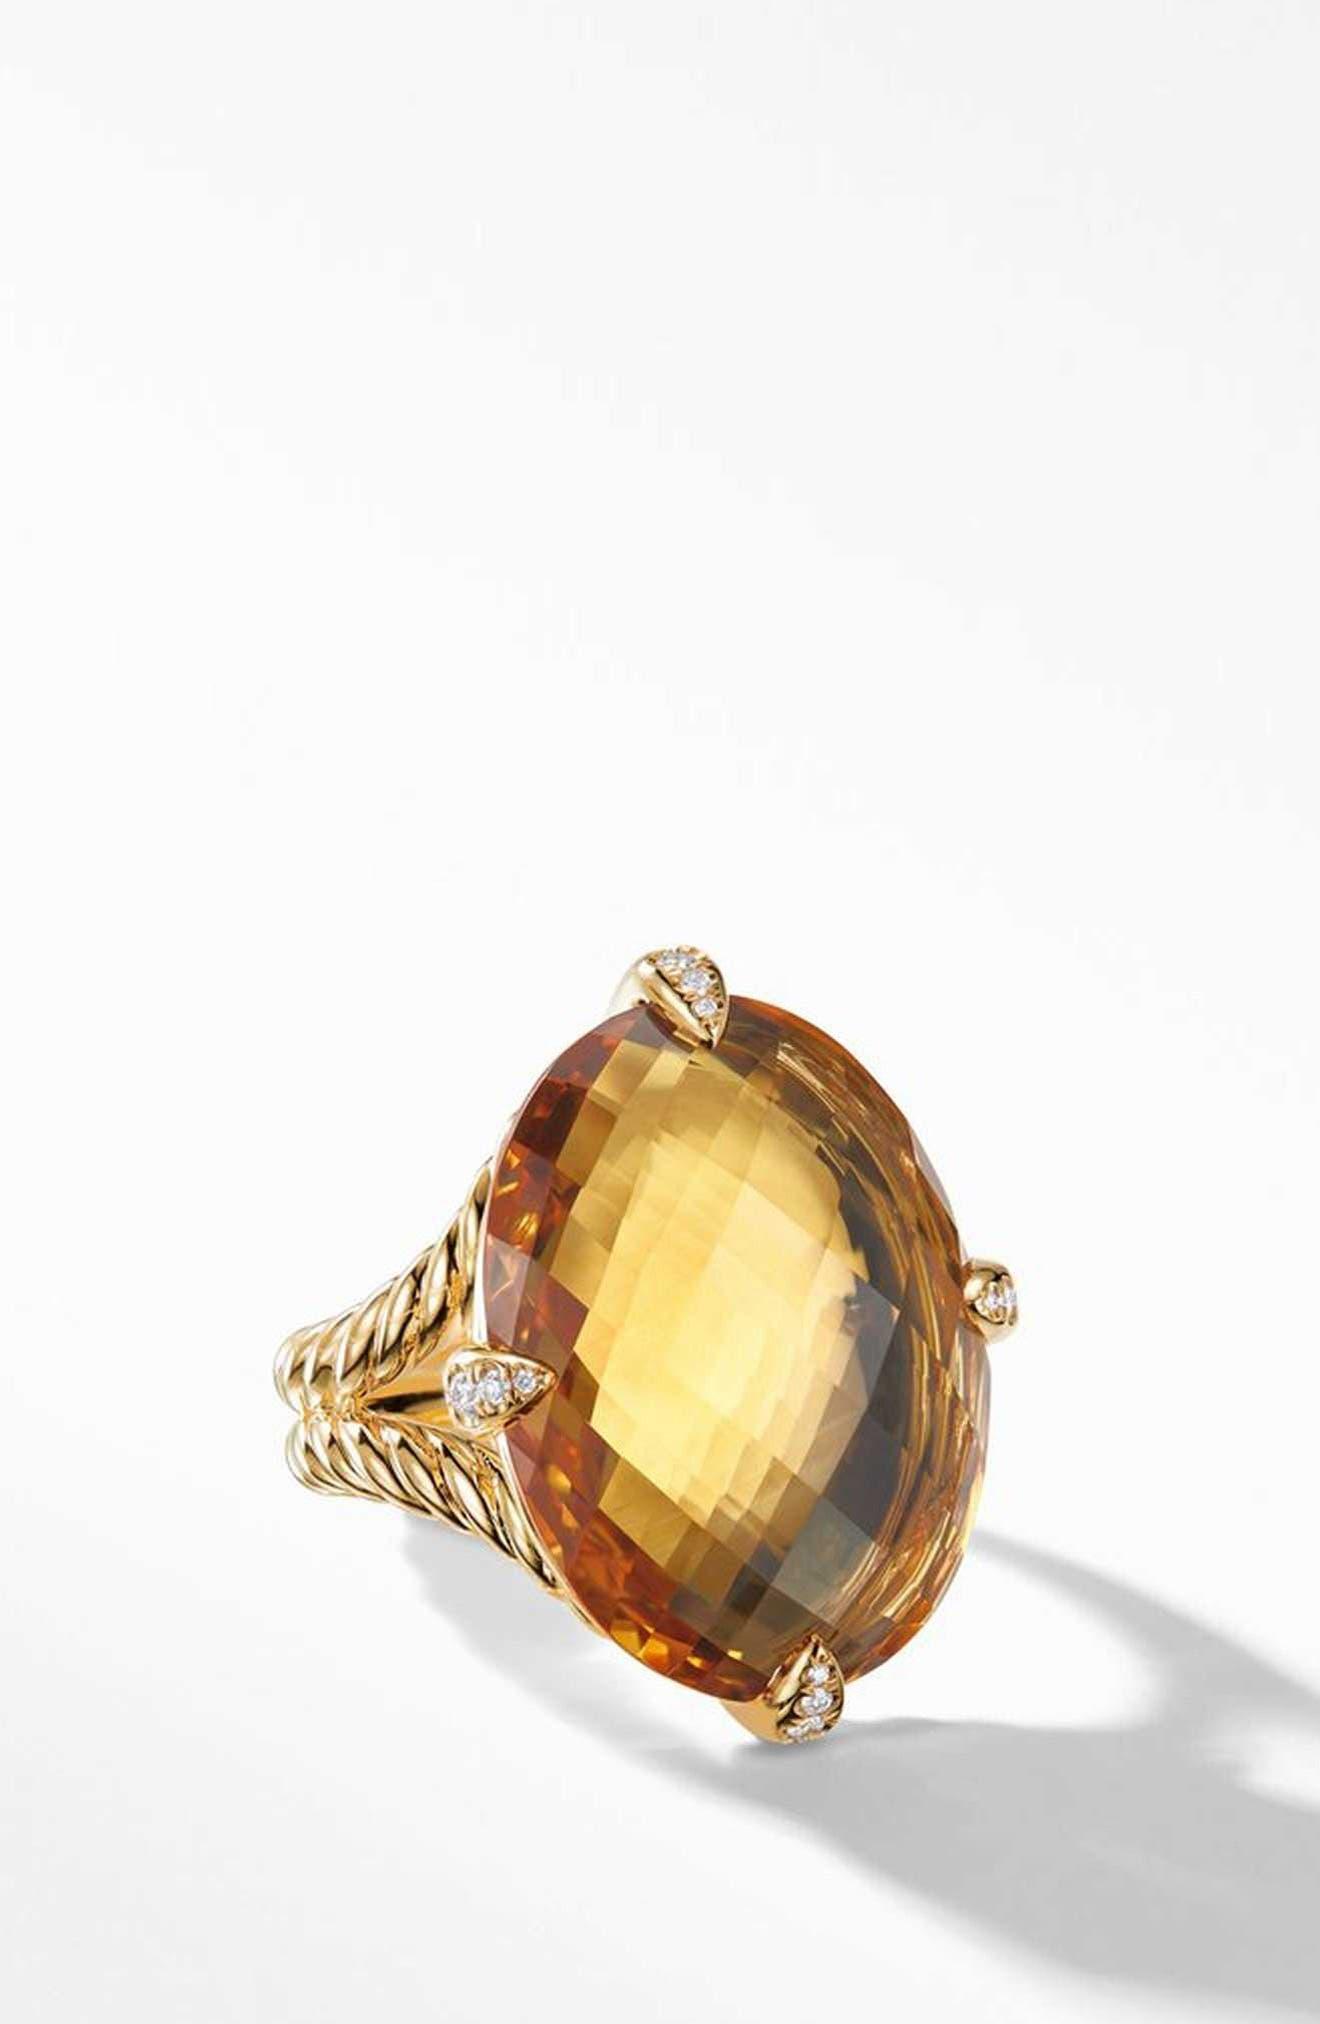 Chatelaine<sup>®</sup> 18k Gold Statement Ring with Honey Quartz & Diamonds,                             Main thumbnail 1, color,                             GOLD/ DIAMOND/ HONEY QUARTZ